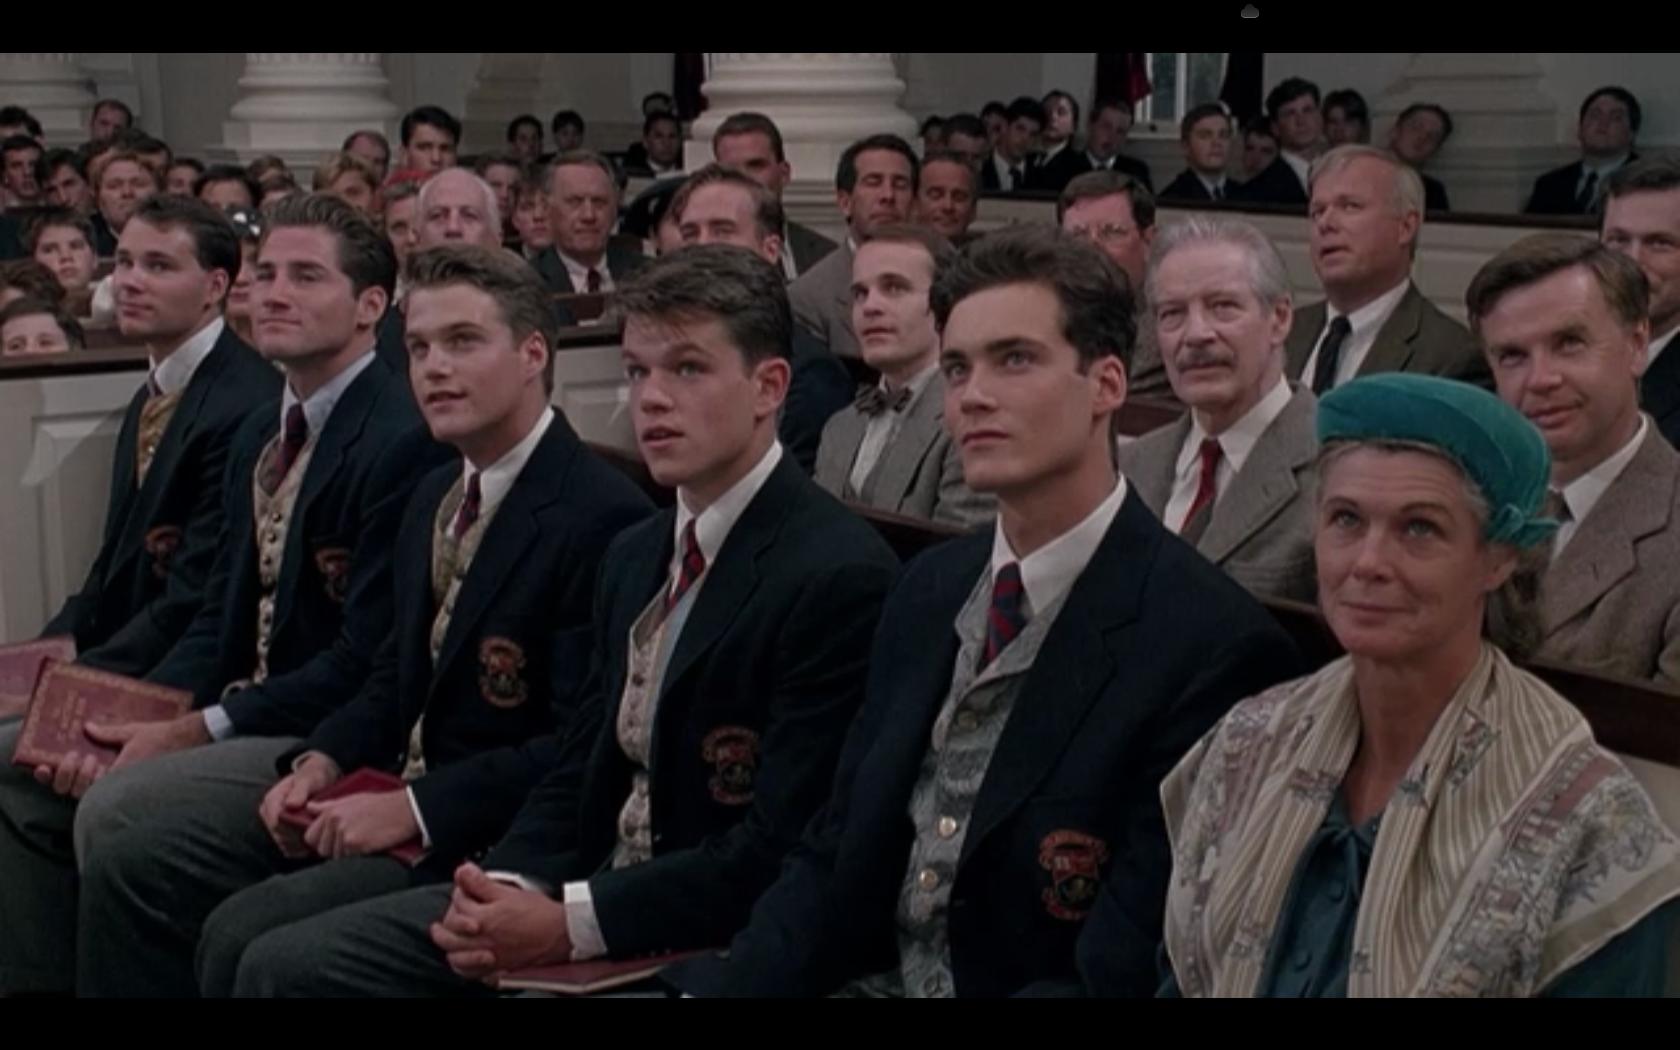 school ties movie - Google-søgning | Randall batinkoff ...